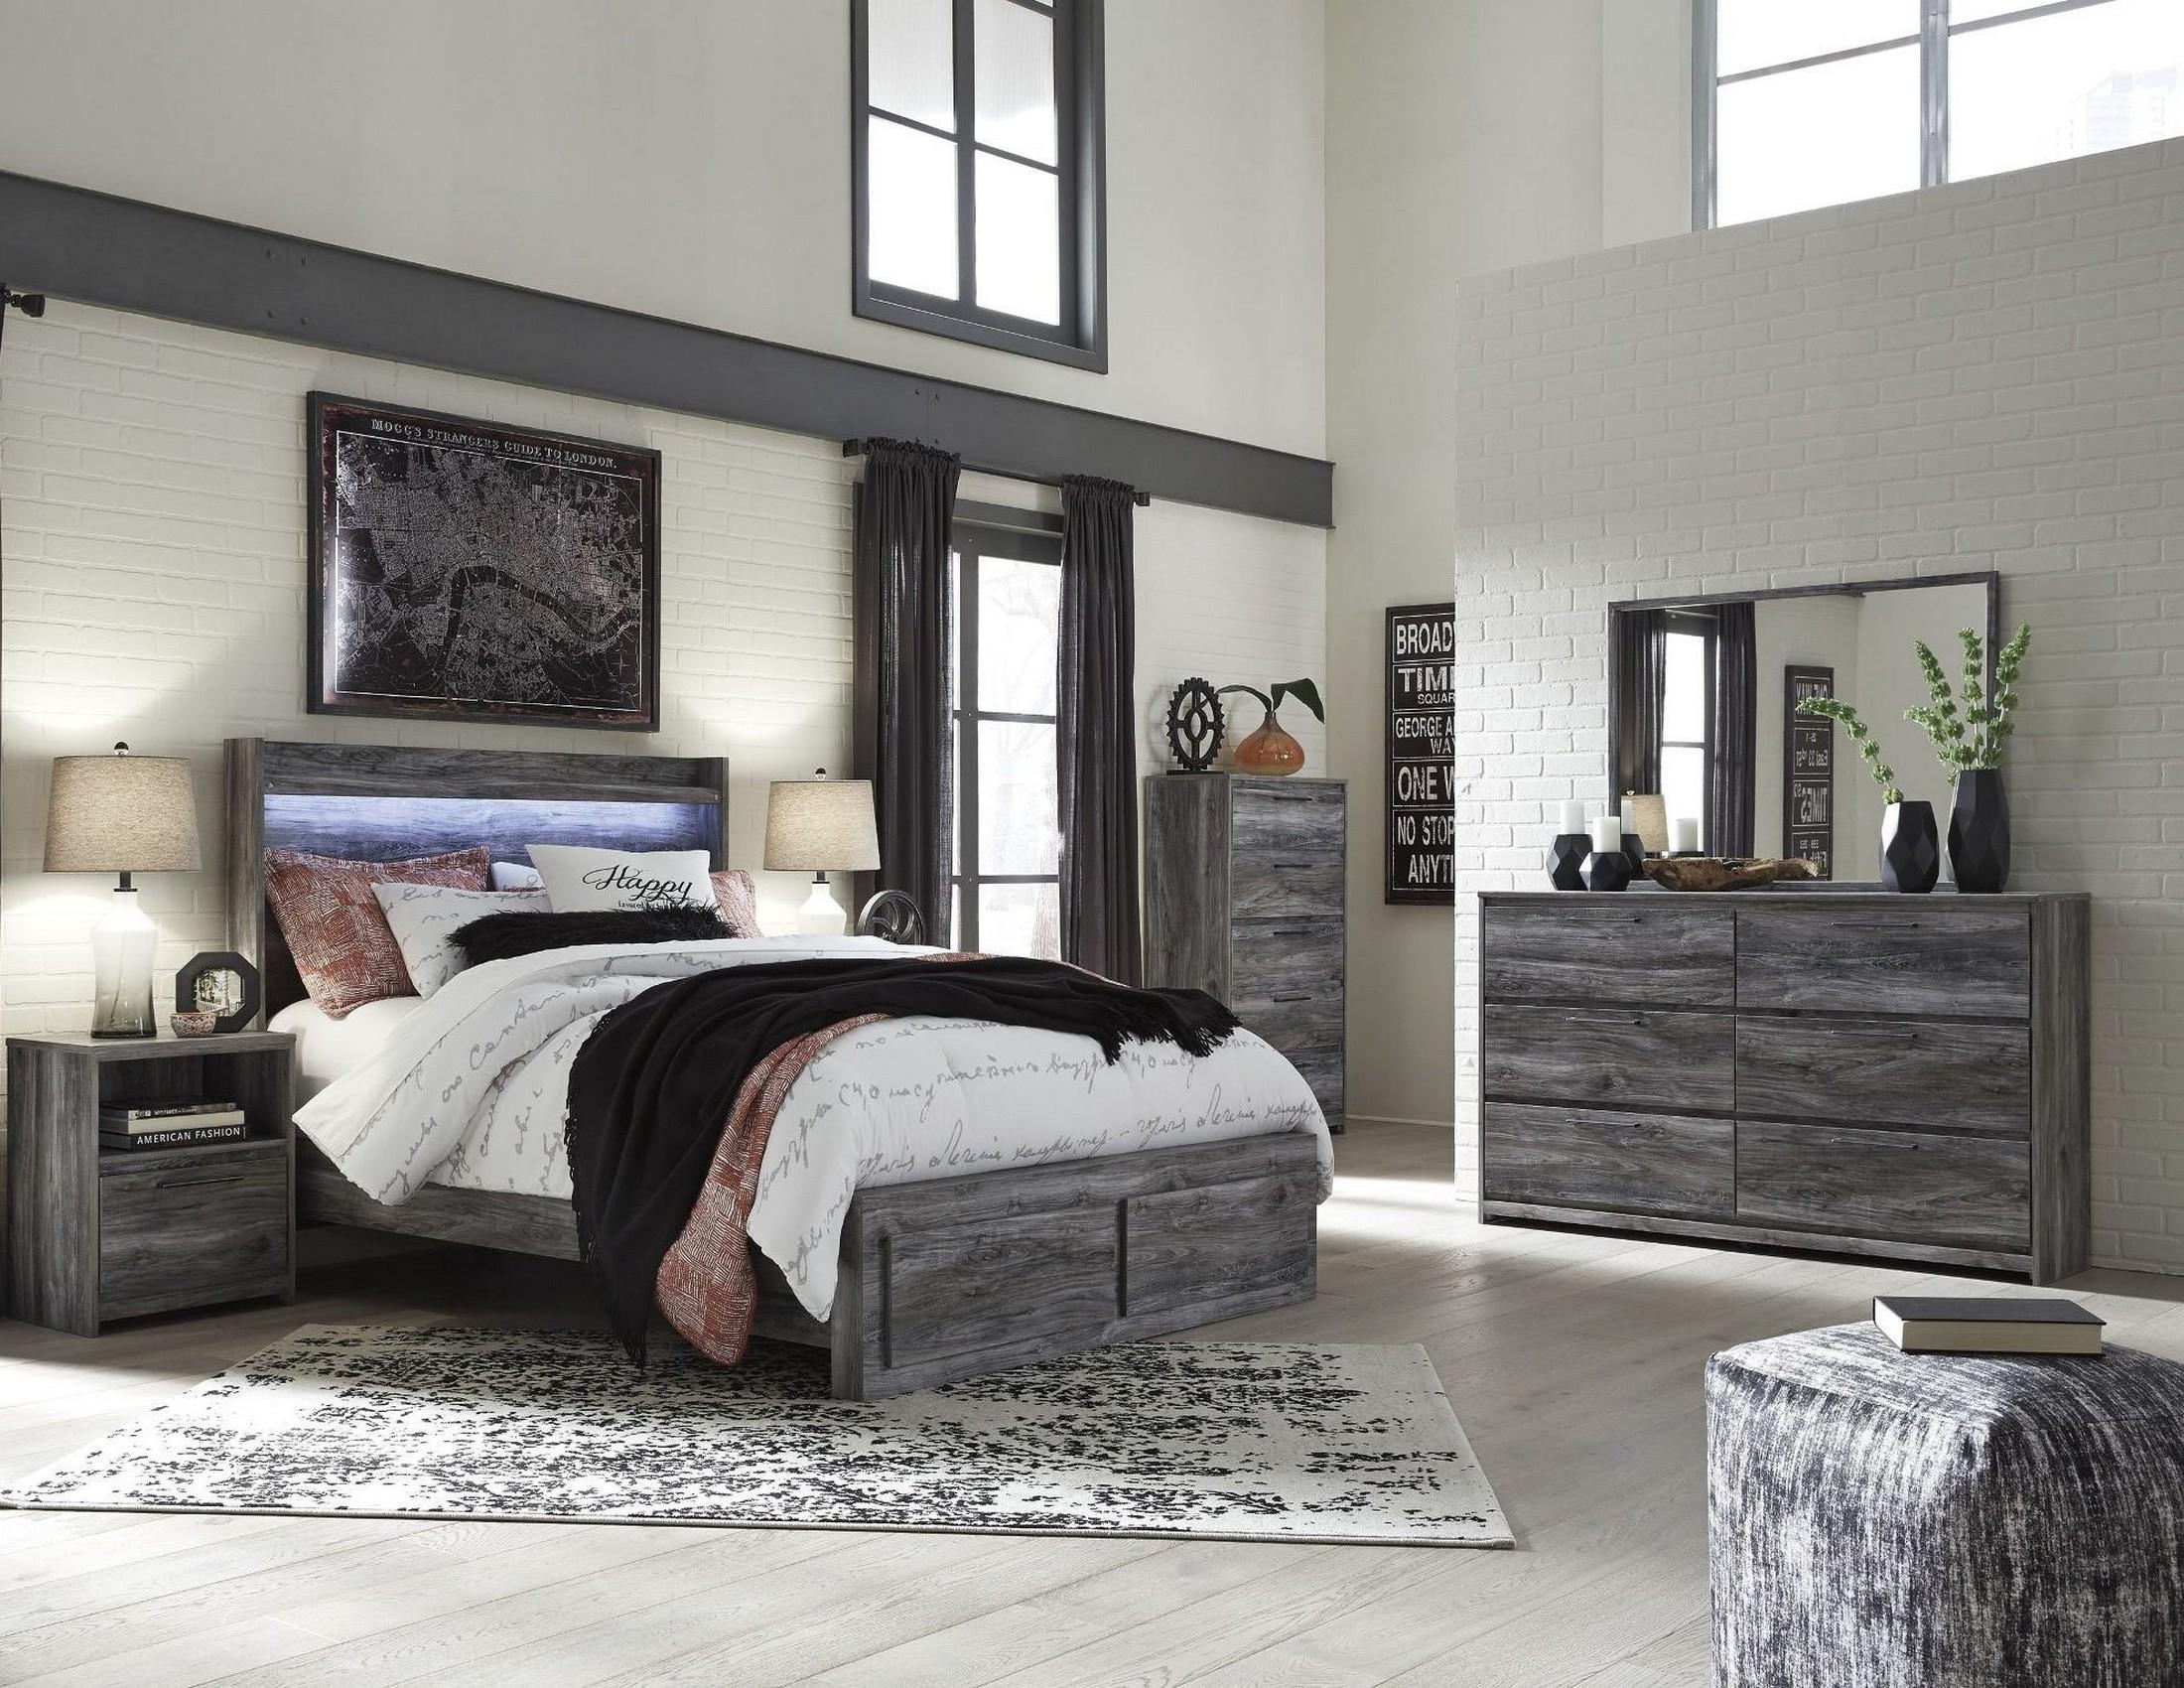 Baystorm Gray Platform Storage Bedroom Set from Ashley